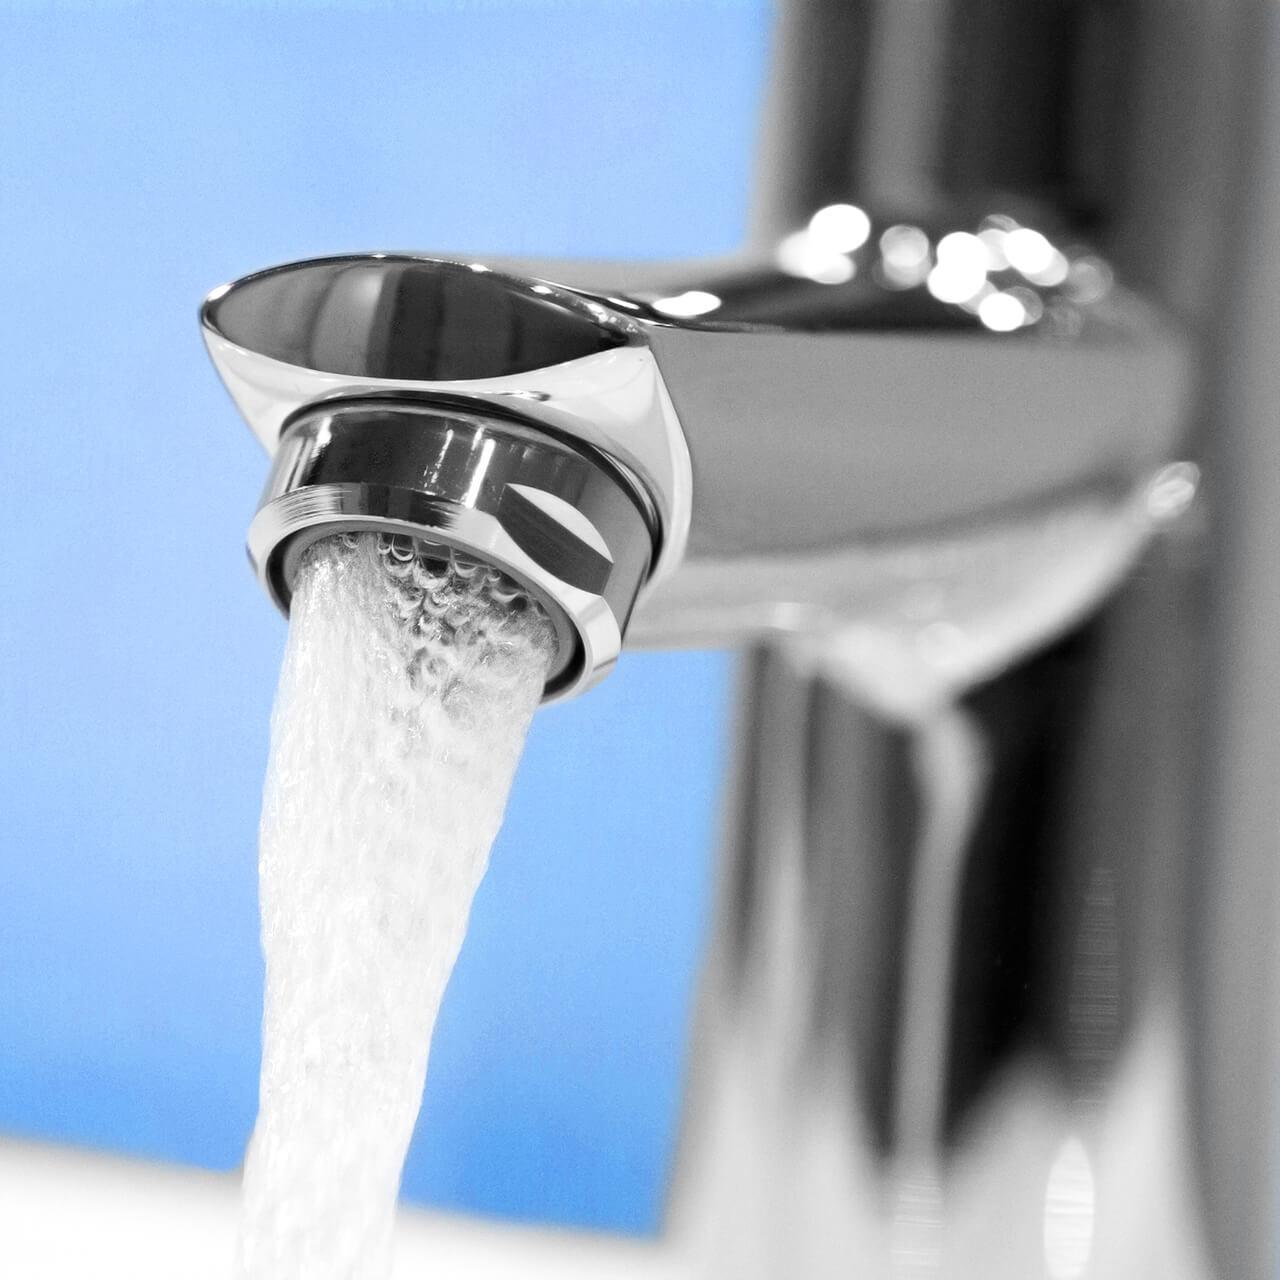 Aireador de ahorro de agua Terla FreeLime 1.7 l/min - Rosca